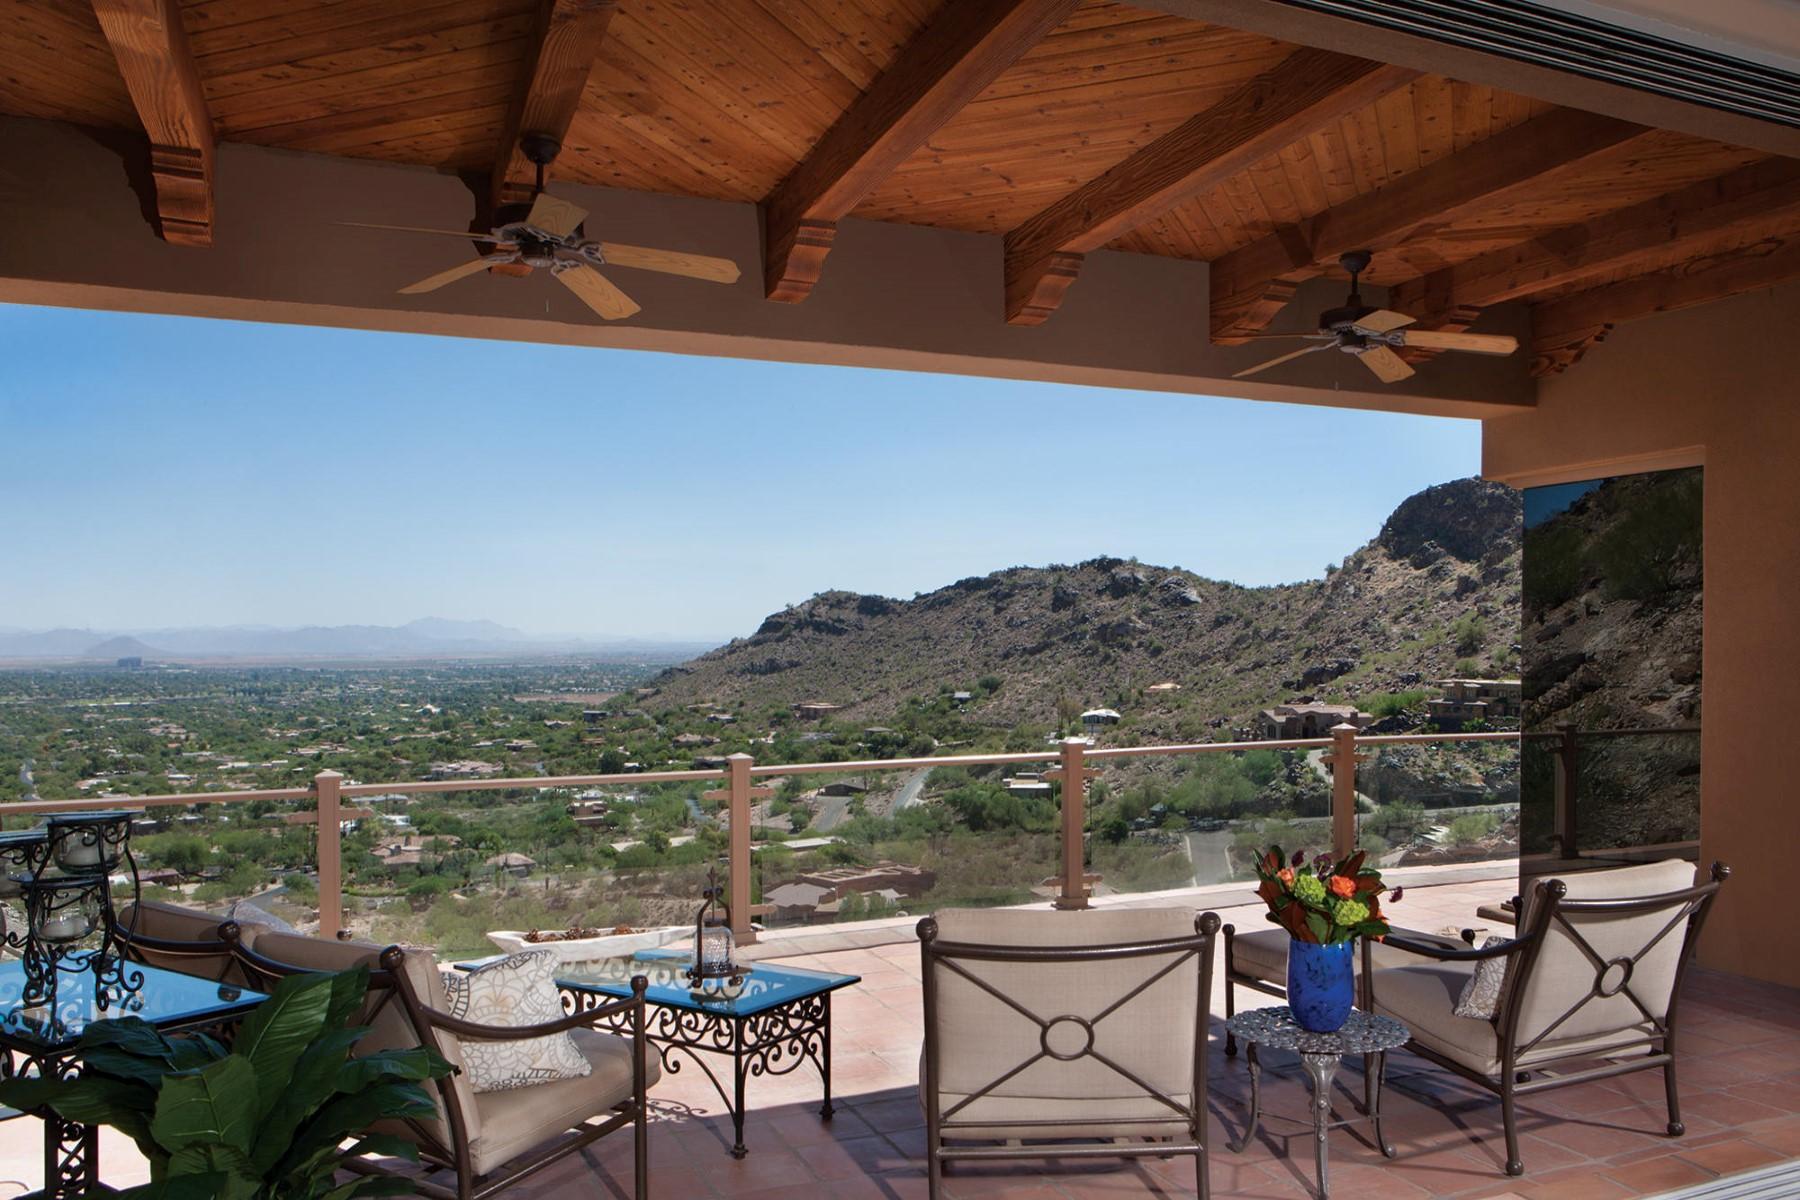 Частный односемейный дом для того Продажа на Impeccably maintained spectacular hillside home with fantastic views 5749 E Cheney Dr Paradise Valley, Аризона, 85253 Соединенные Штаты